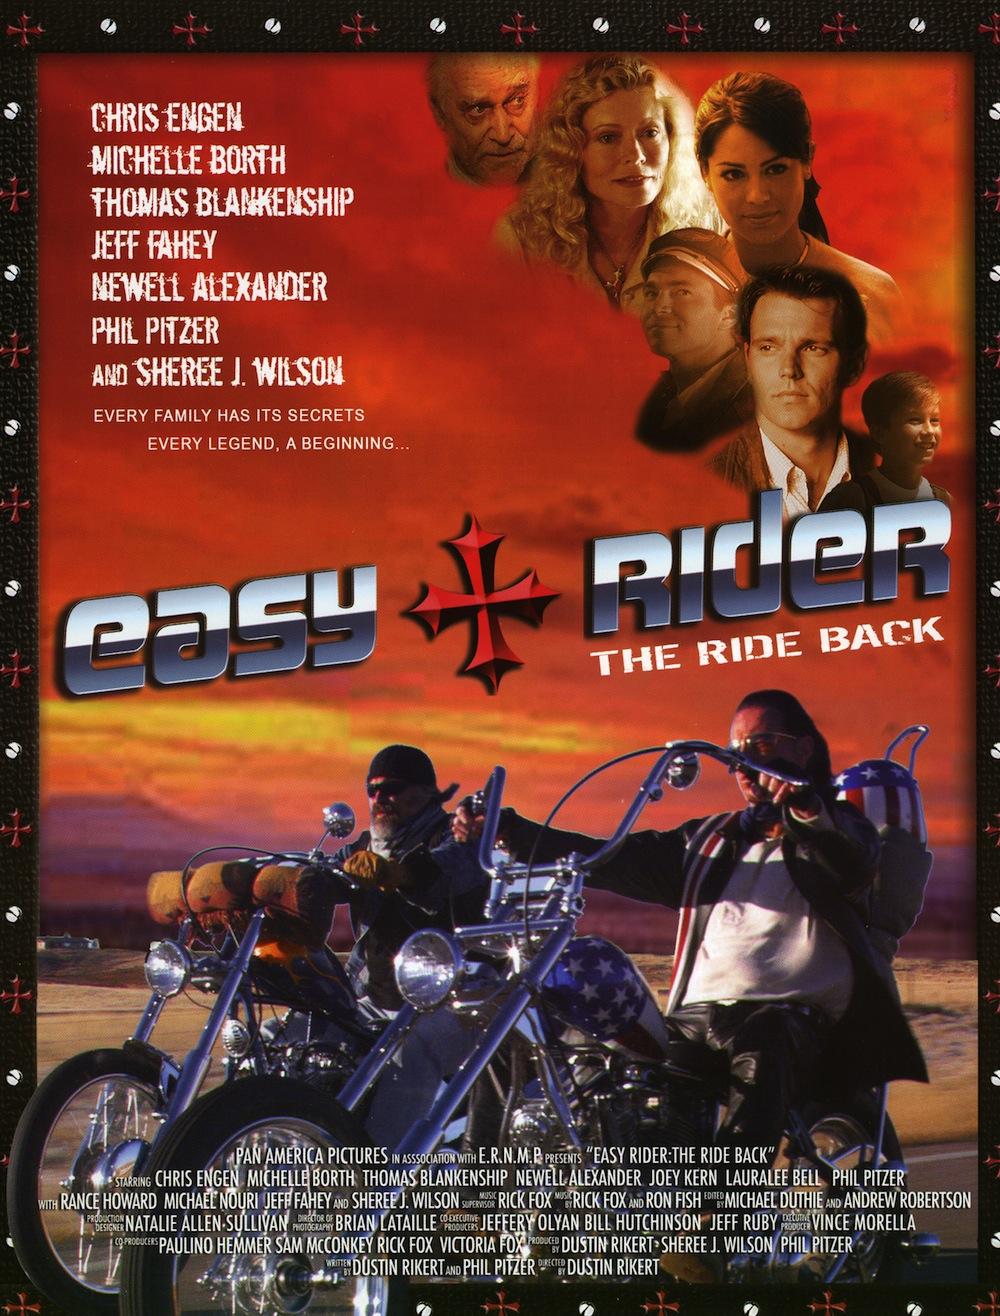 Easy rider the ride back poster.jpg